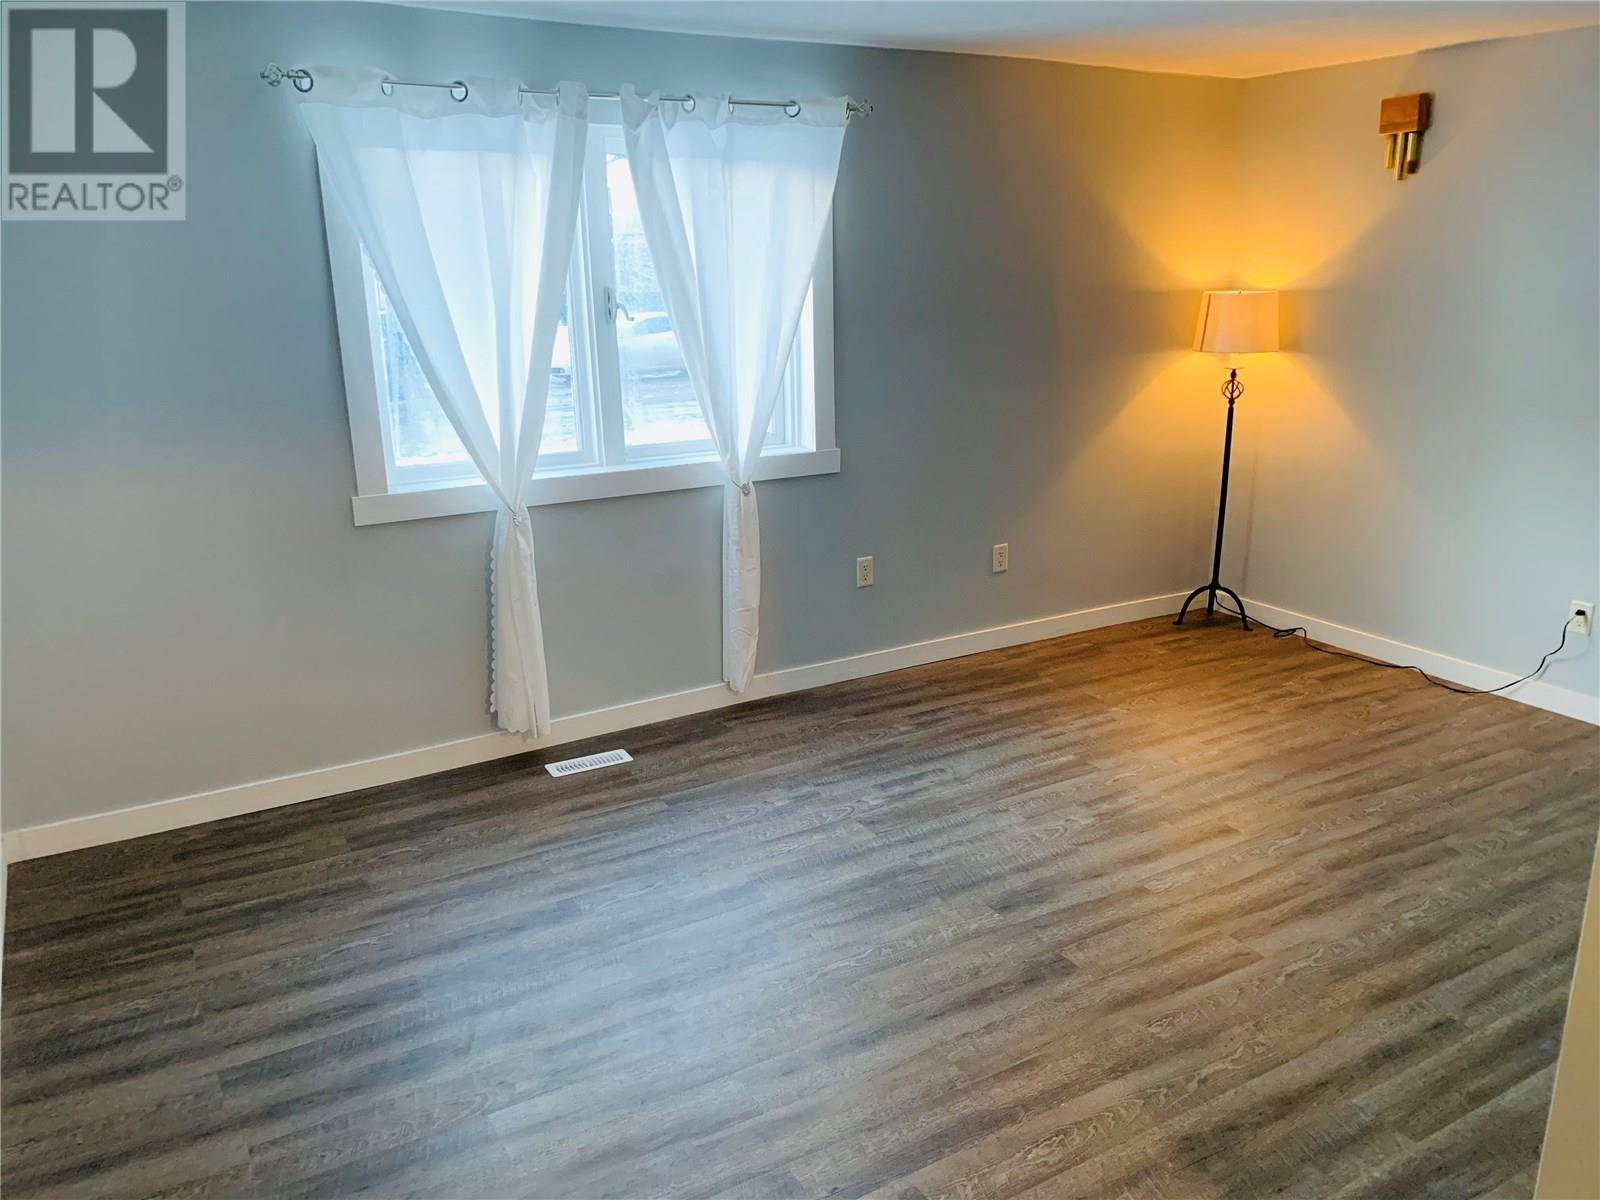 House for sale at 157 John St N Regina Saskatchewan - MLS: SK798507